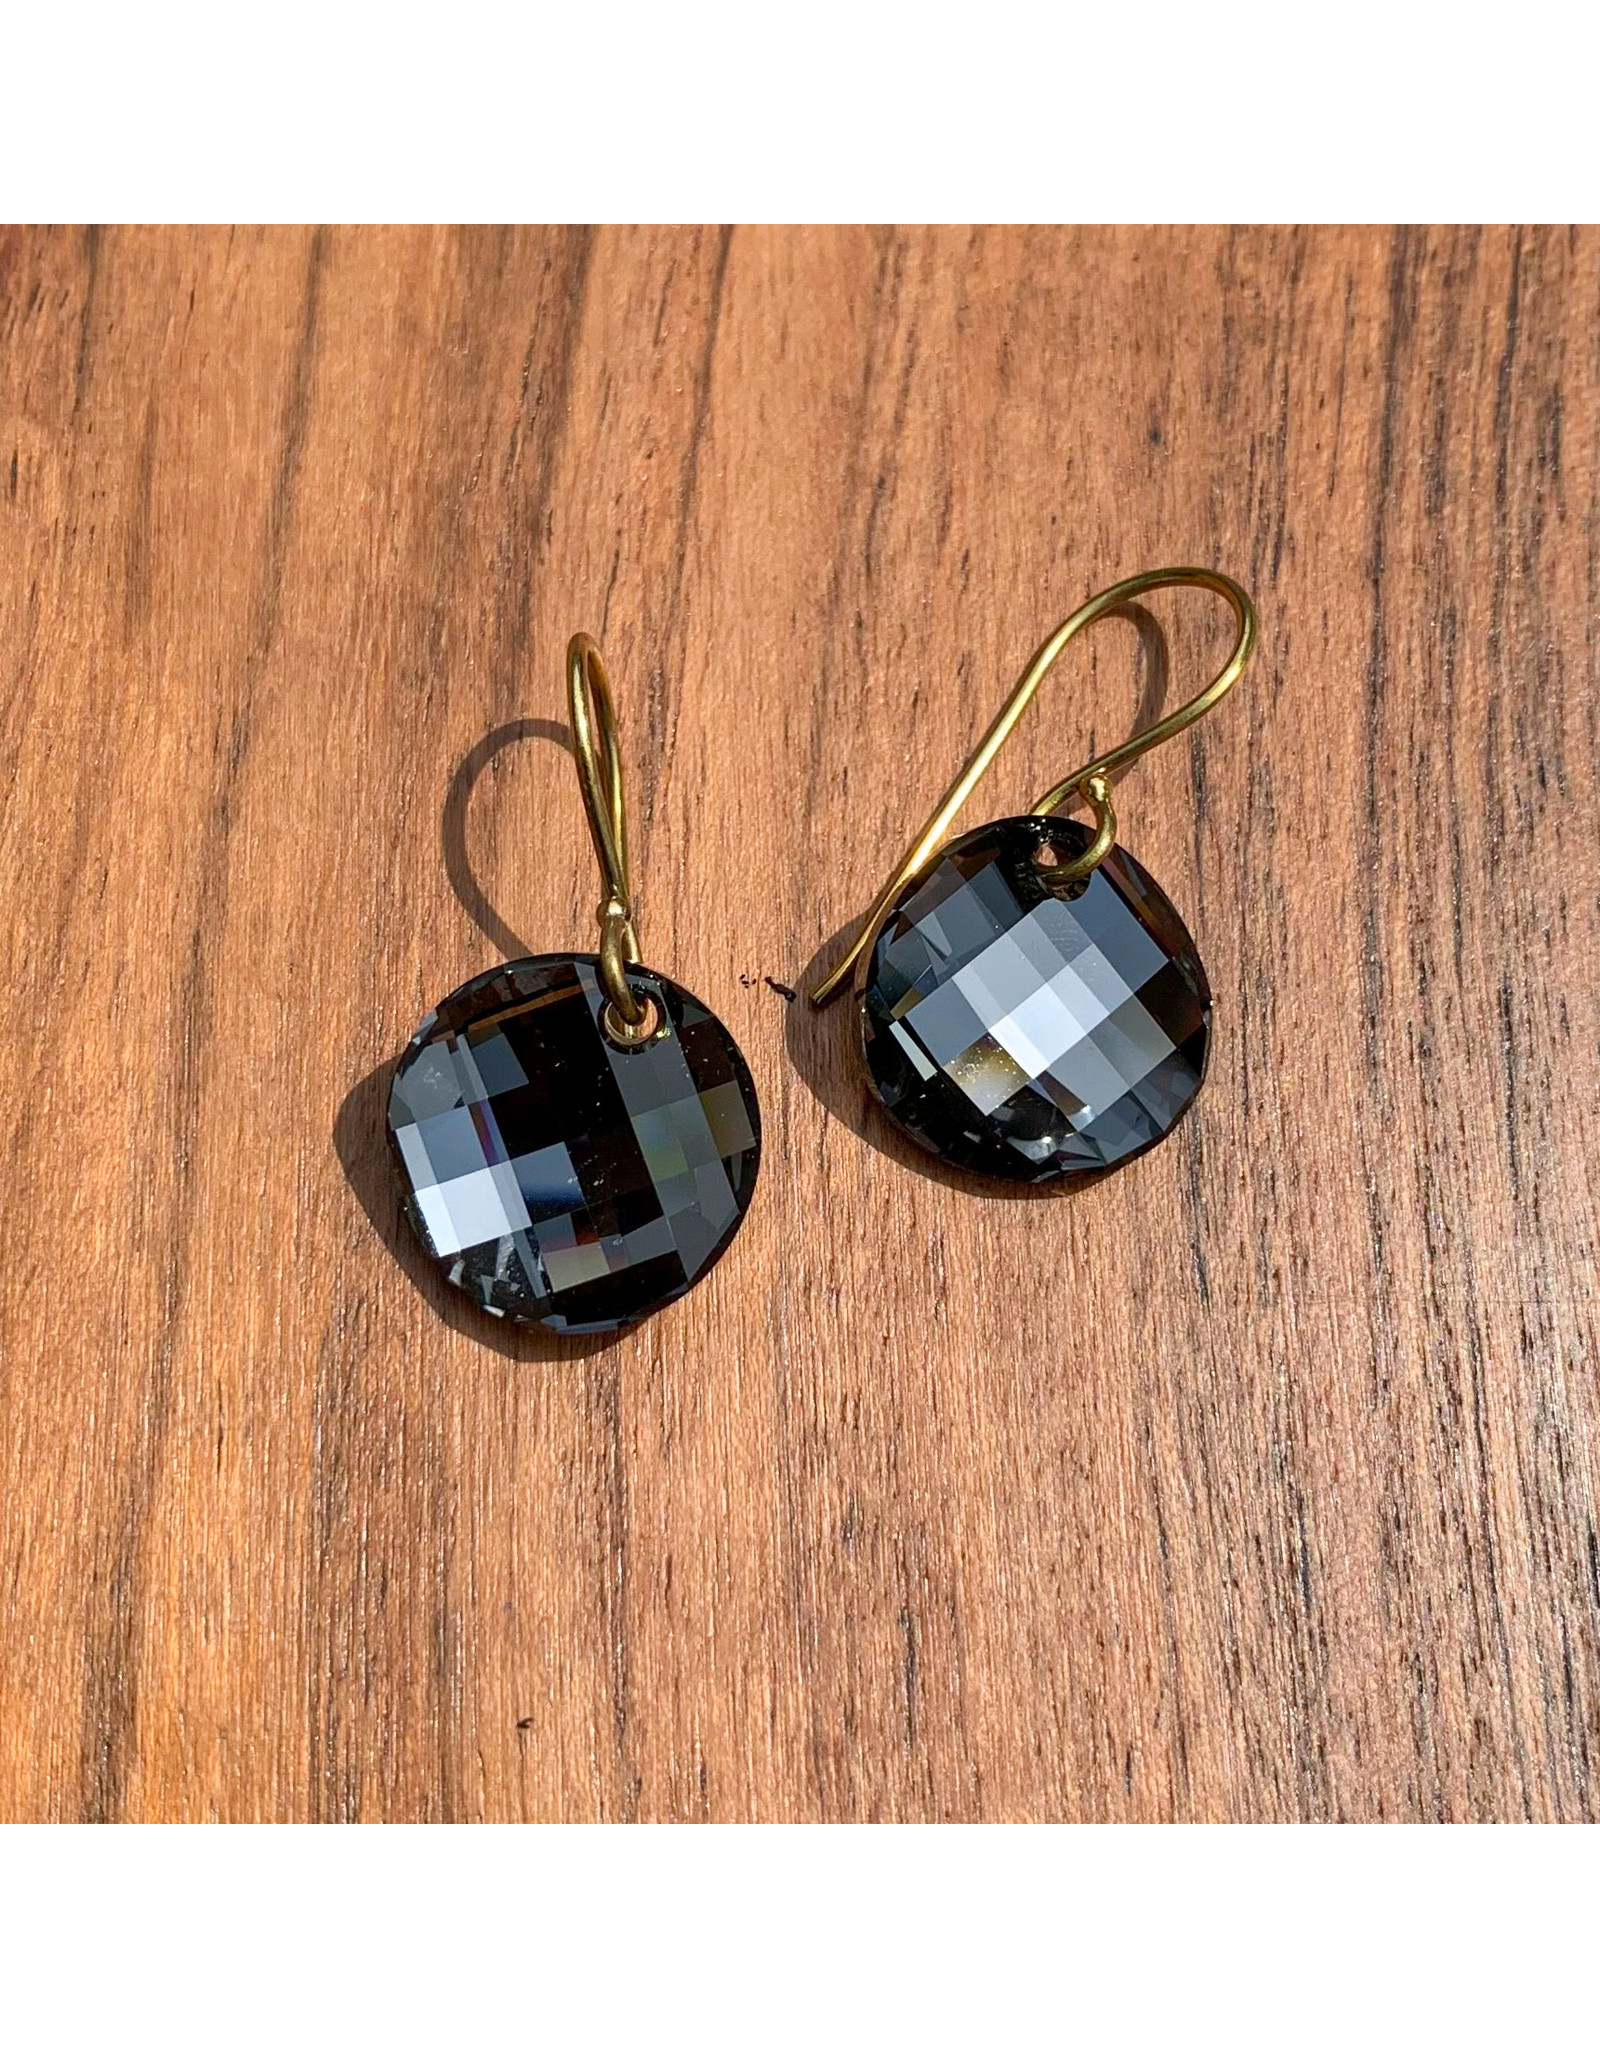 Diablo Organics Diablo Organics Black Diamond Twist Swarovski traditional earrings on brass coils